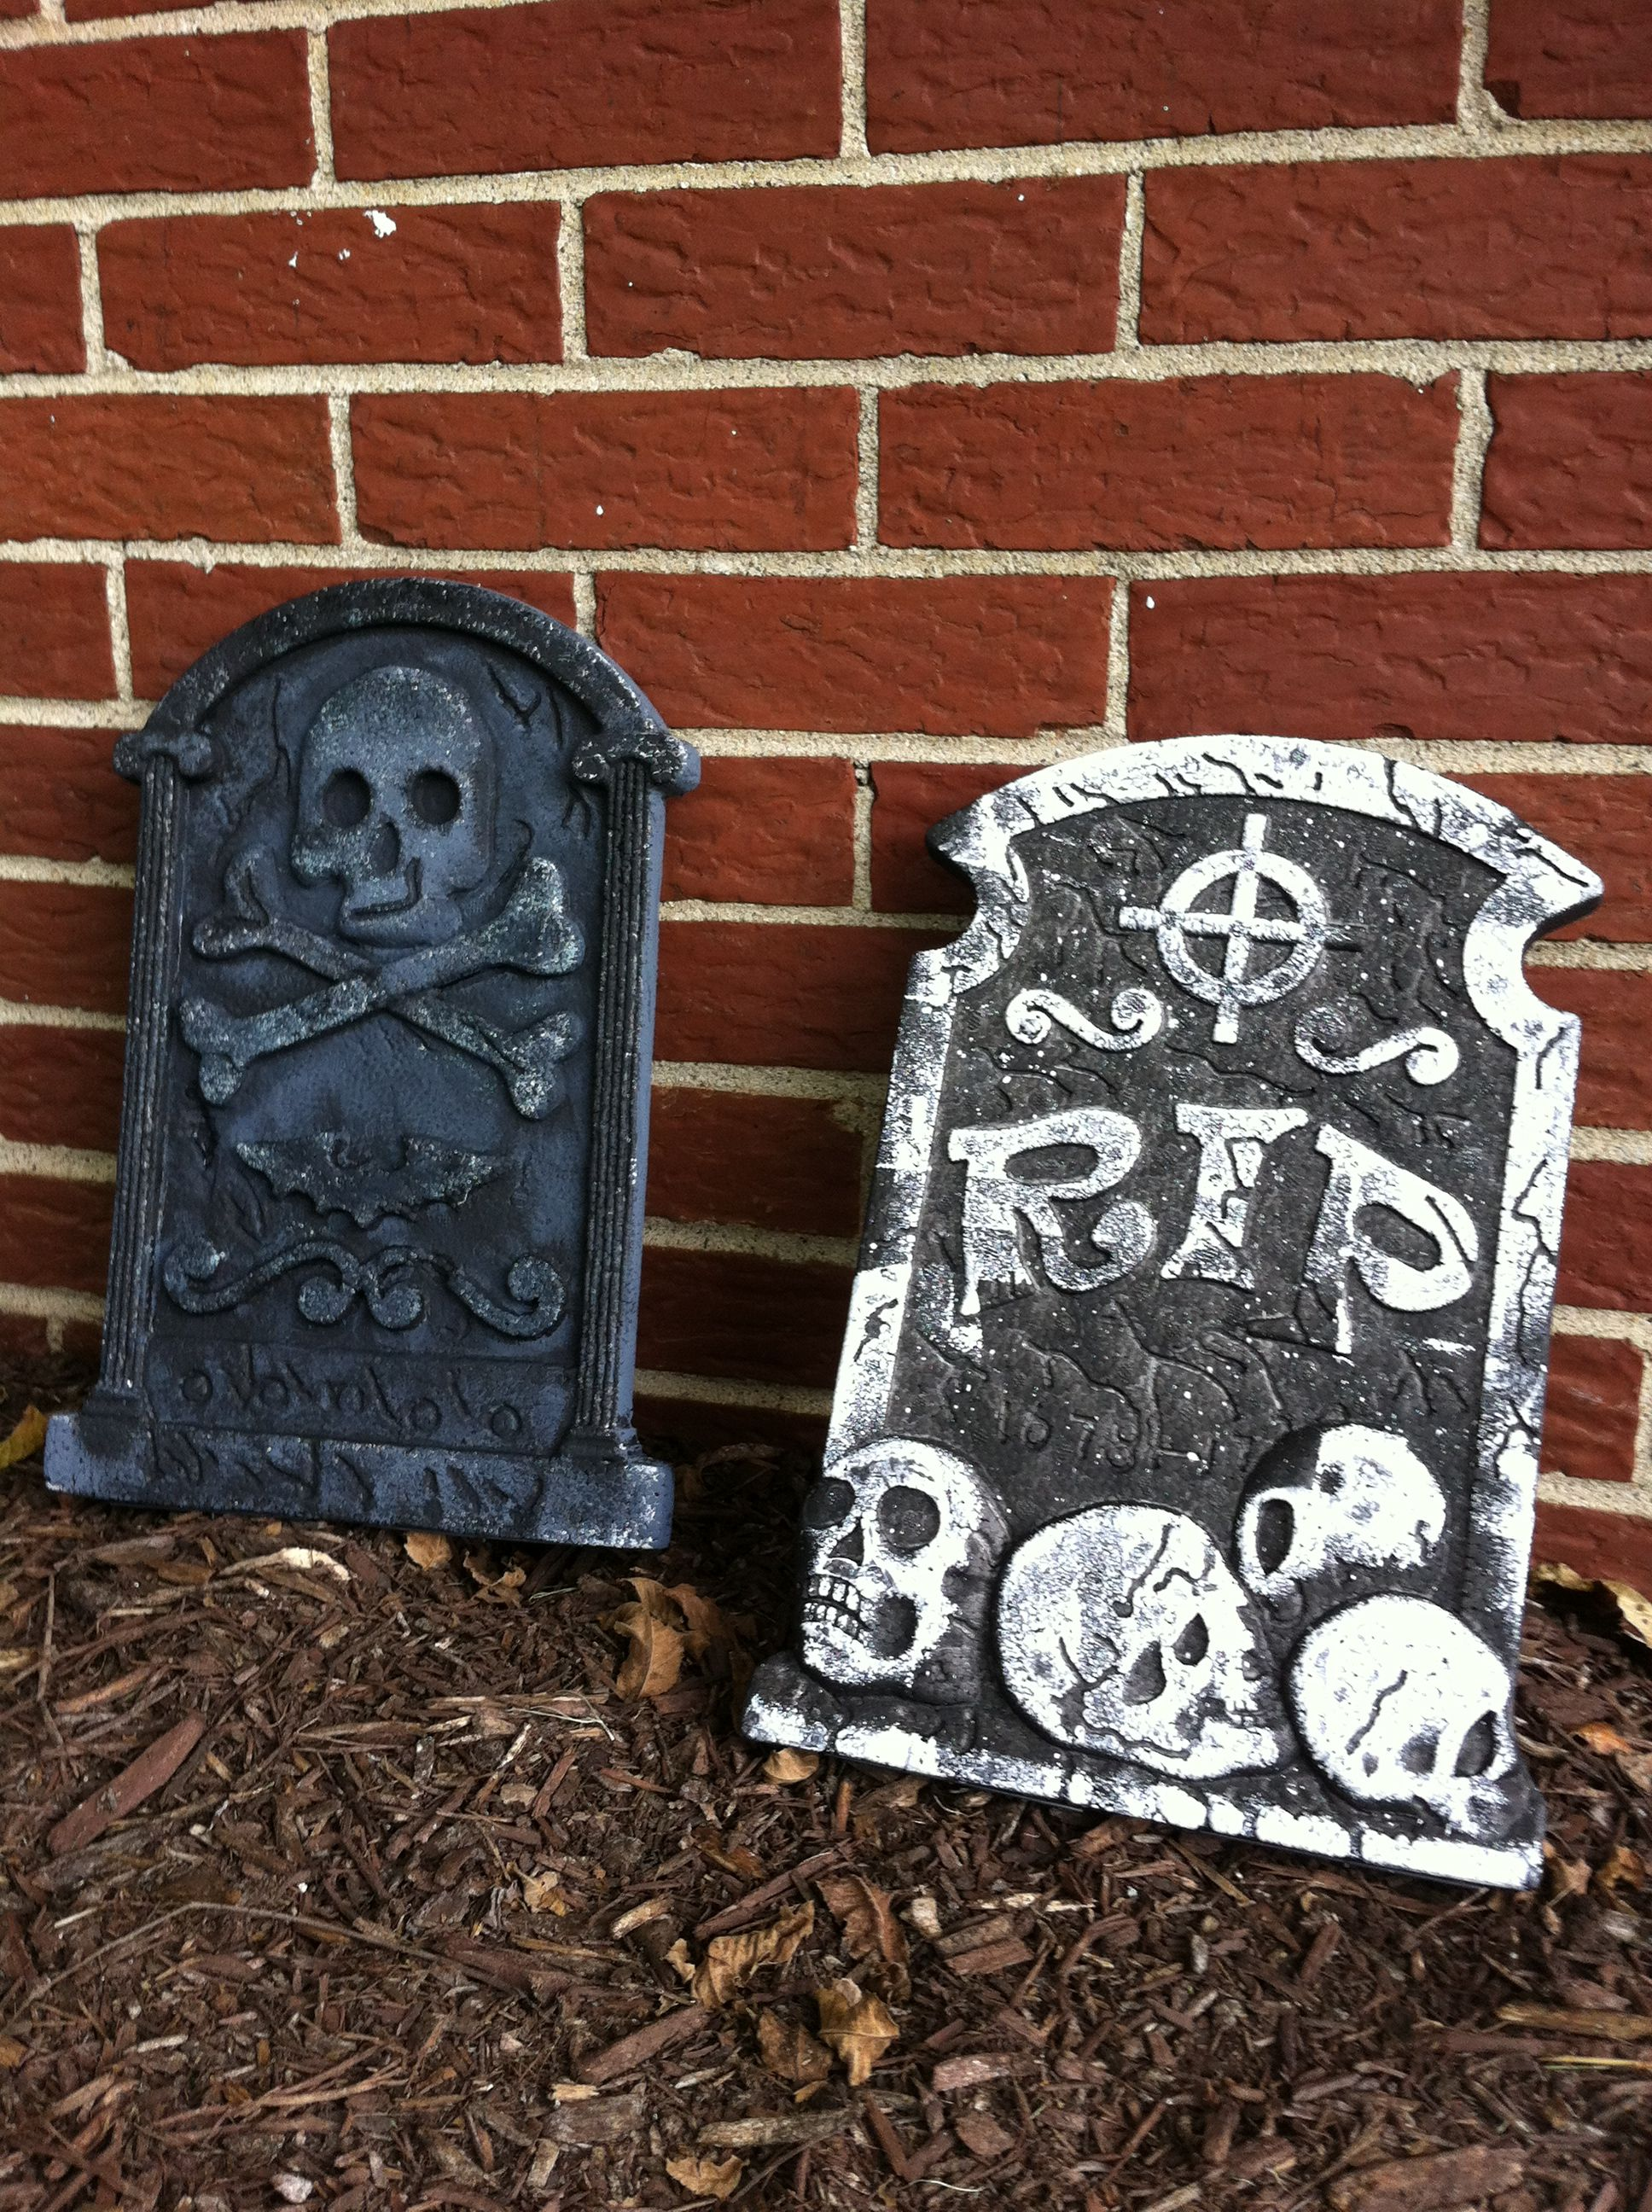 halloween chair covers dollar tree rental utah take styrofoam tombstones and paint them like